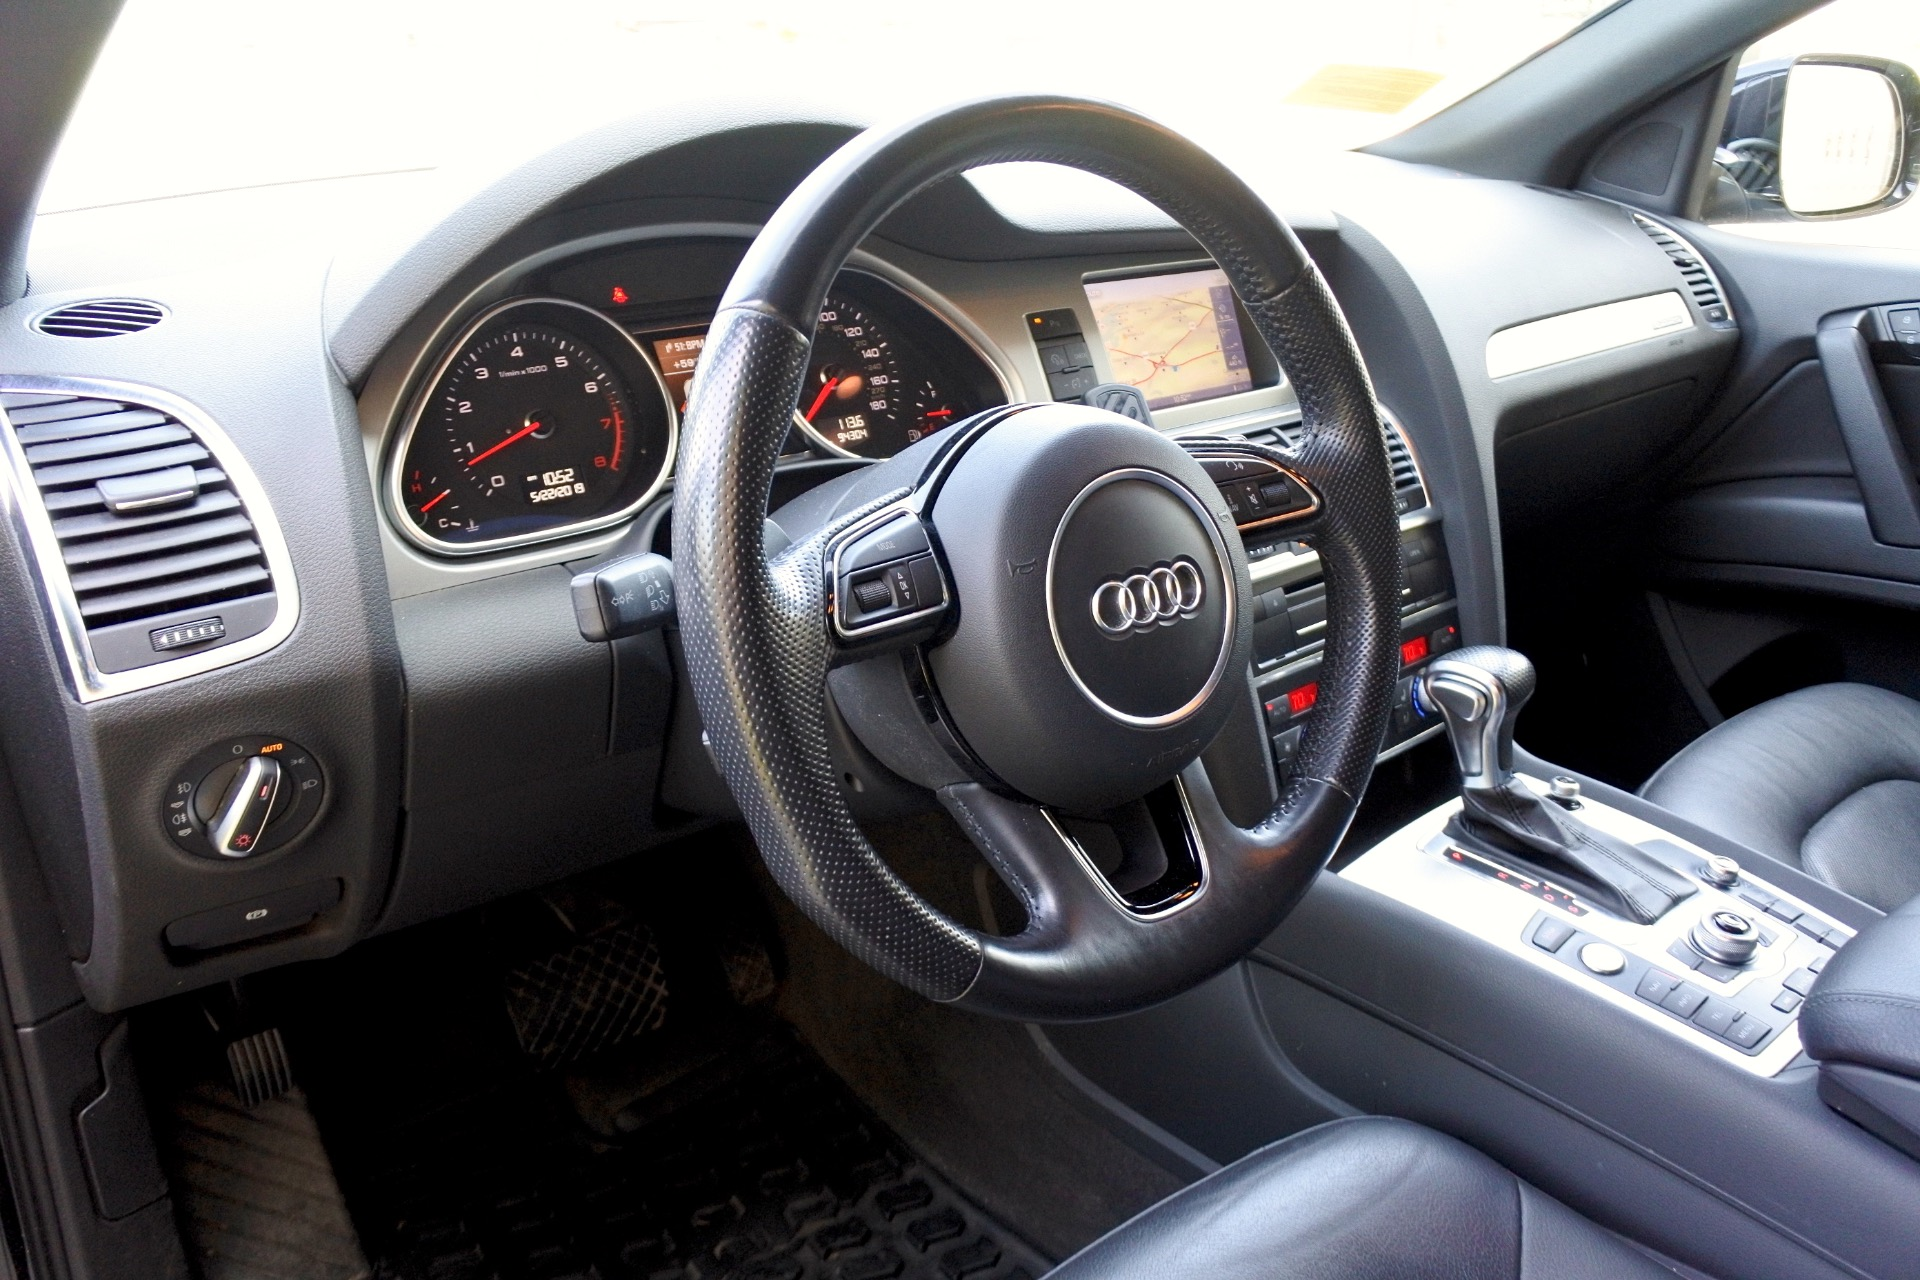 Used 2014 Audi Q7 3.0T S line Prestige Used 2014 Audi Q7 3.0T S line Prestige for sale  at Metro West Motorcars LLC in Shrewsbury MA 12